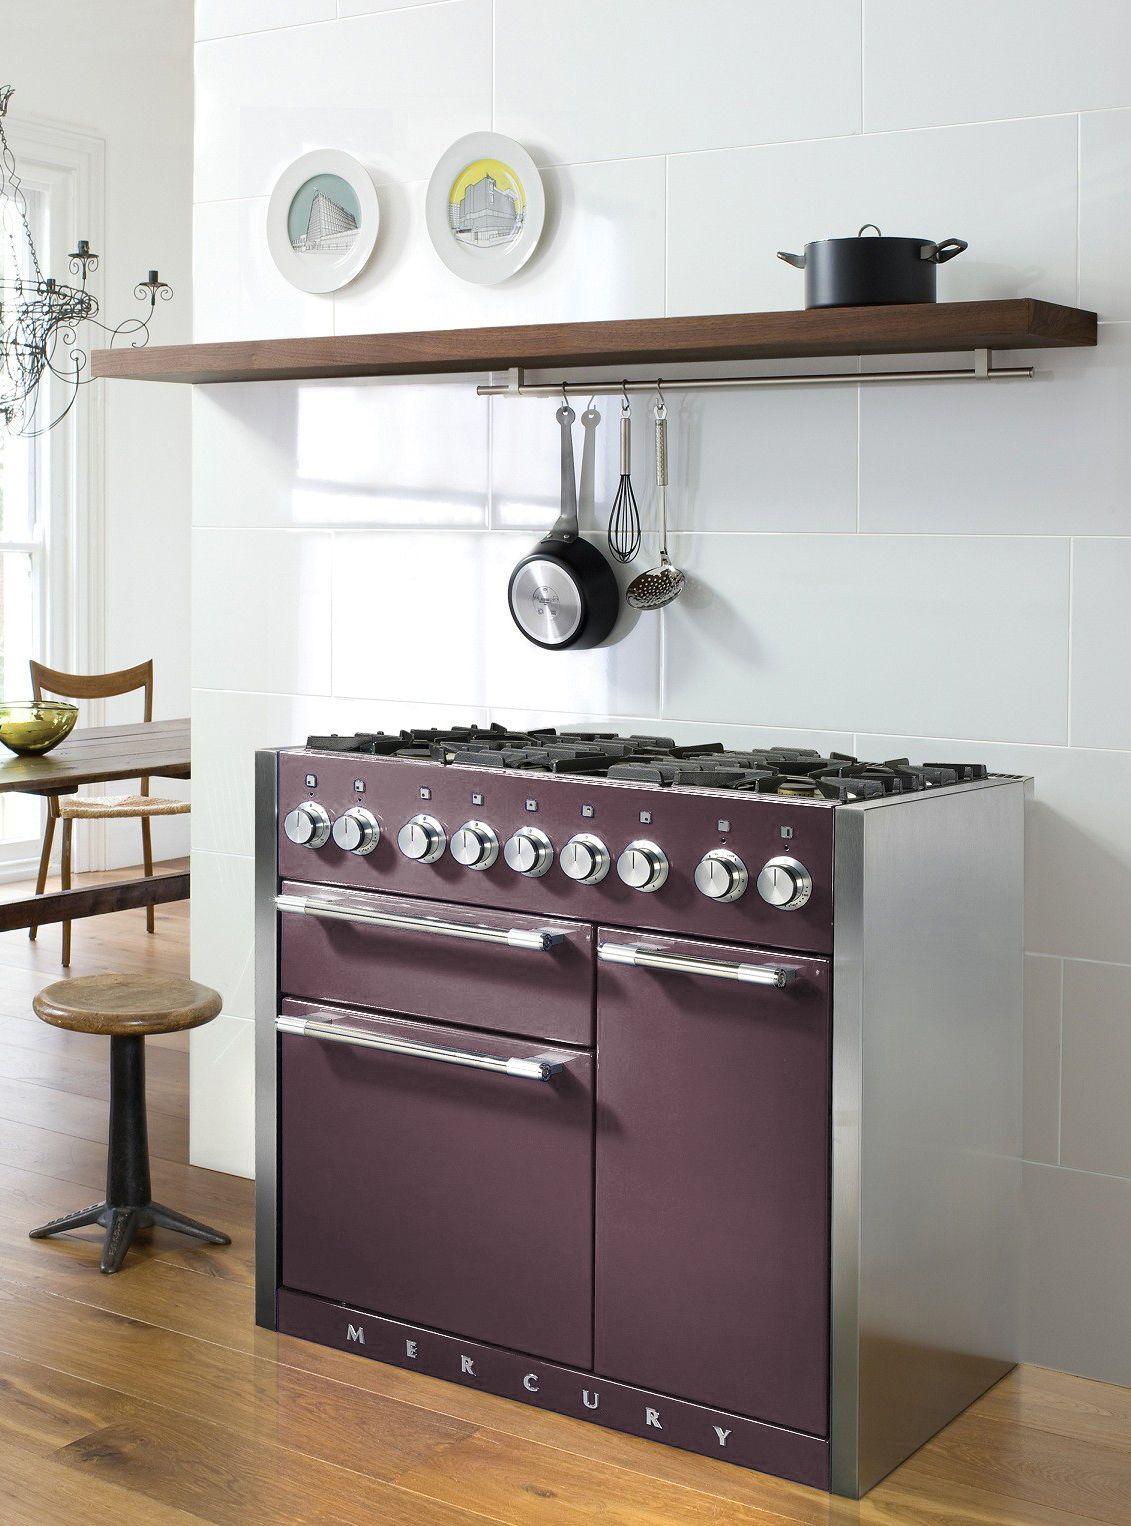 Mercury Range Cooker In Purple Haze | Quality | Style | Inspiration | Design  | Power